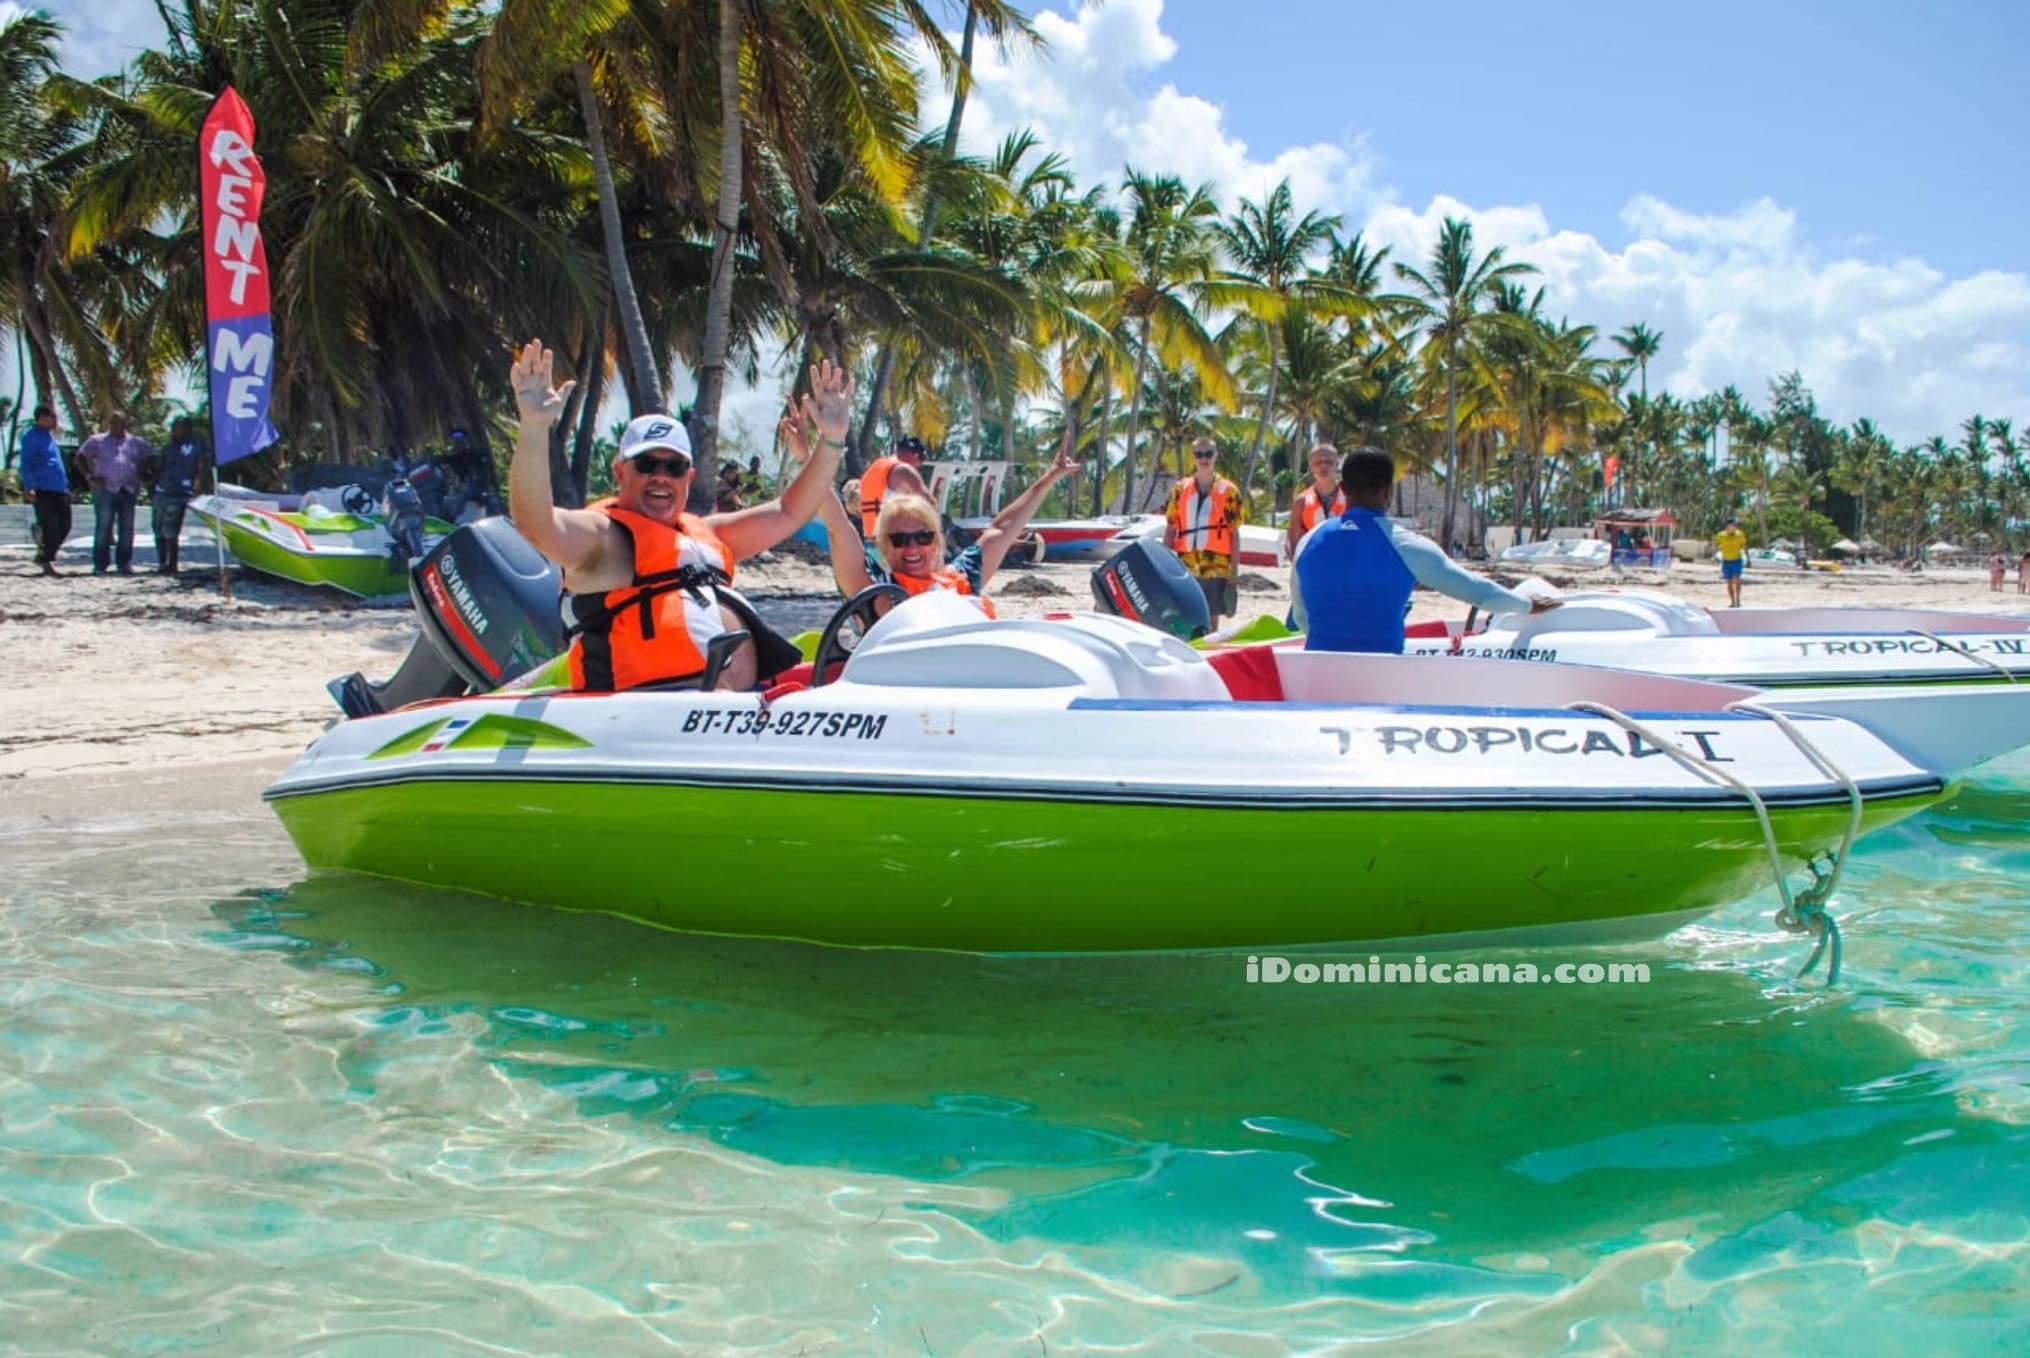 Гонки на скоростных лодках в Доминикане iDominicana.com